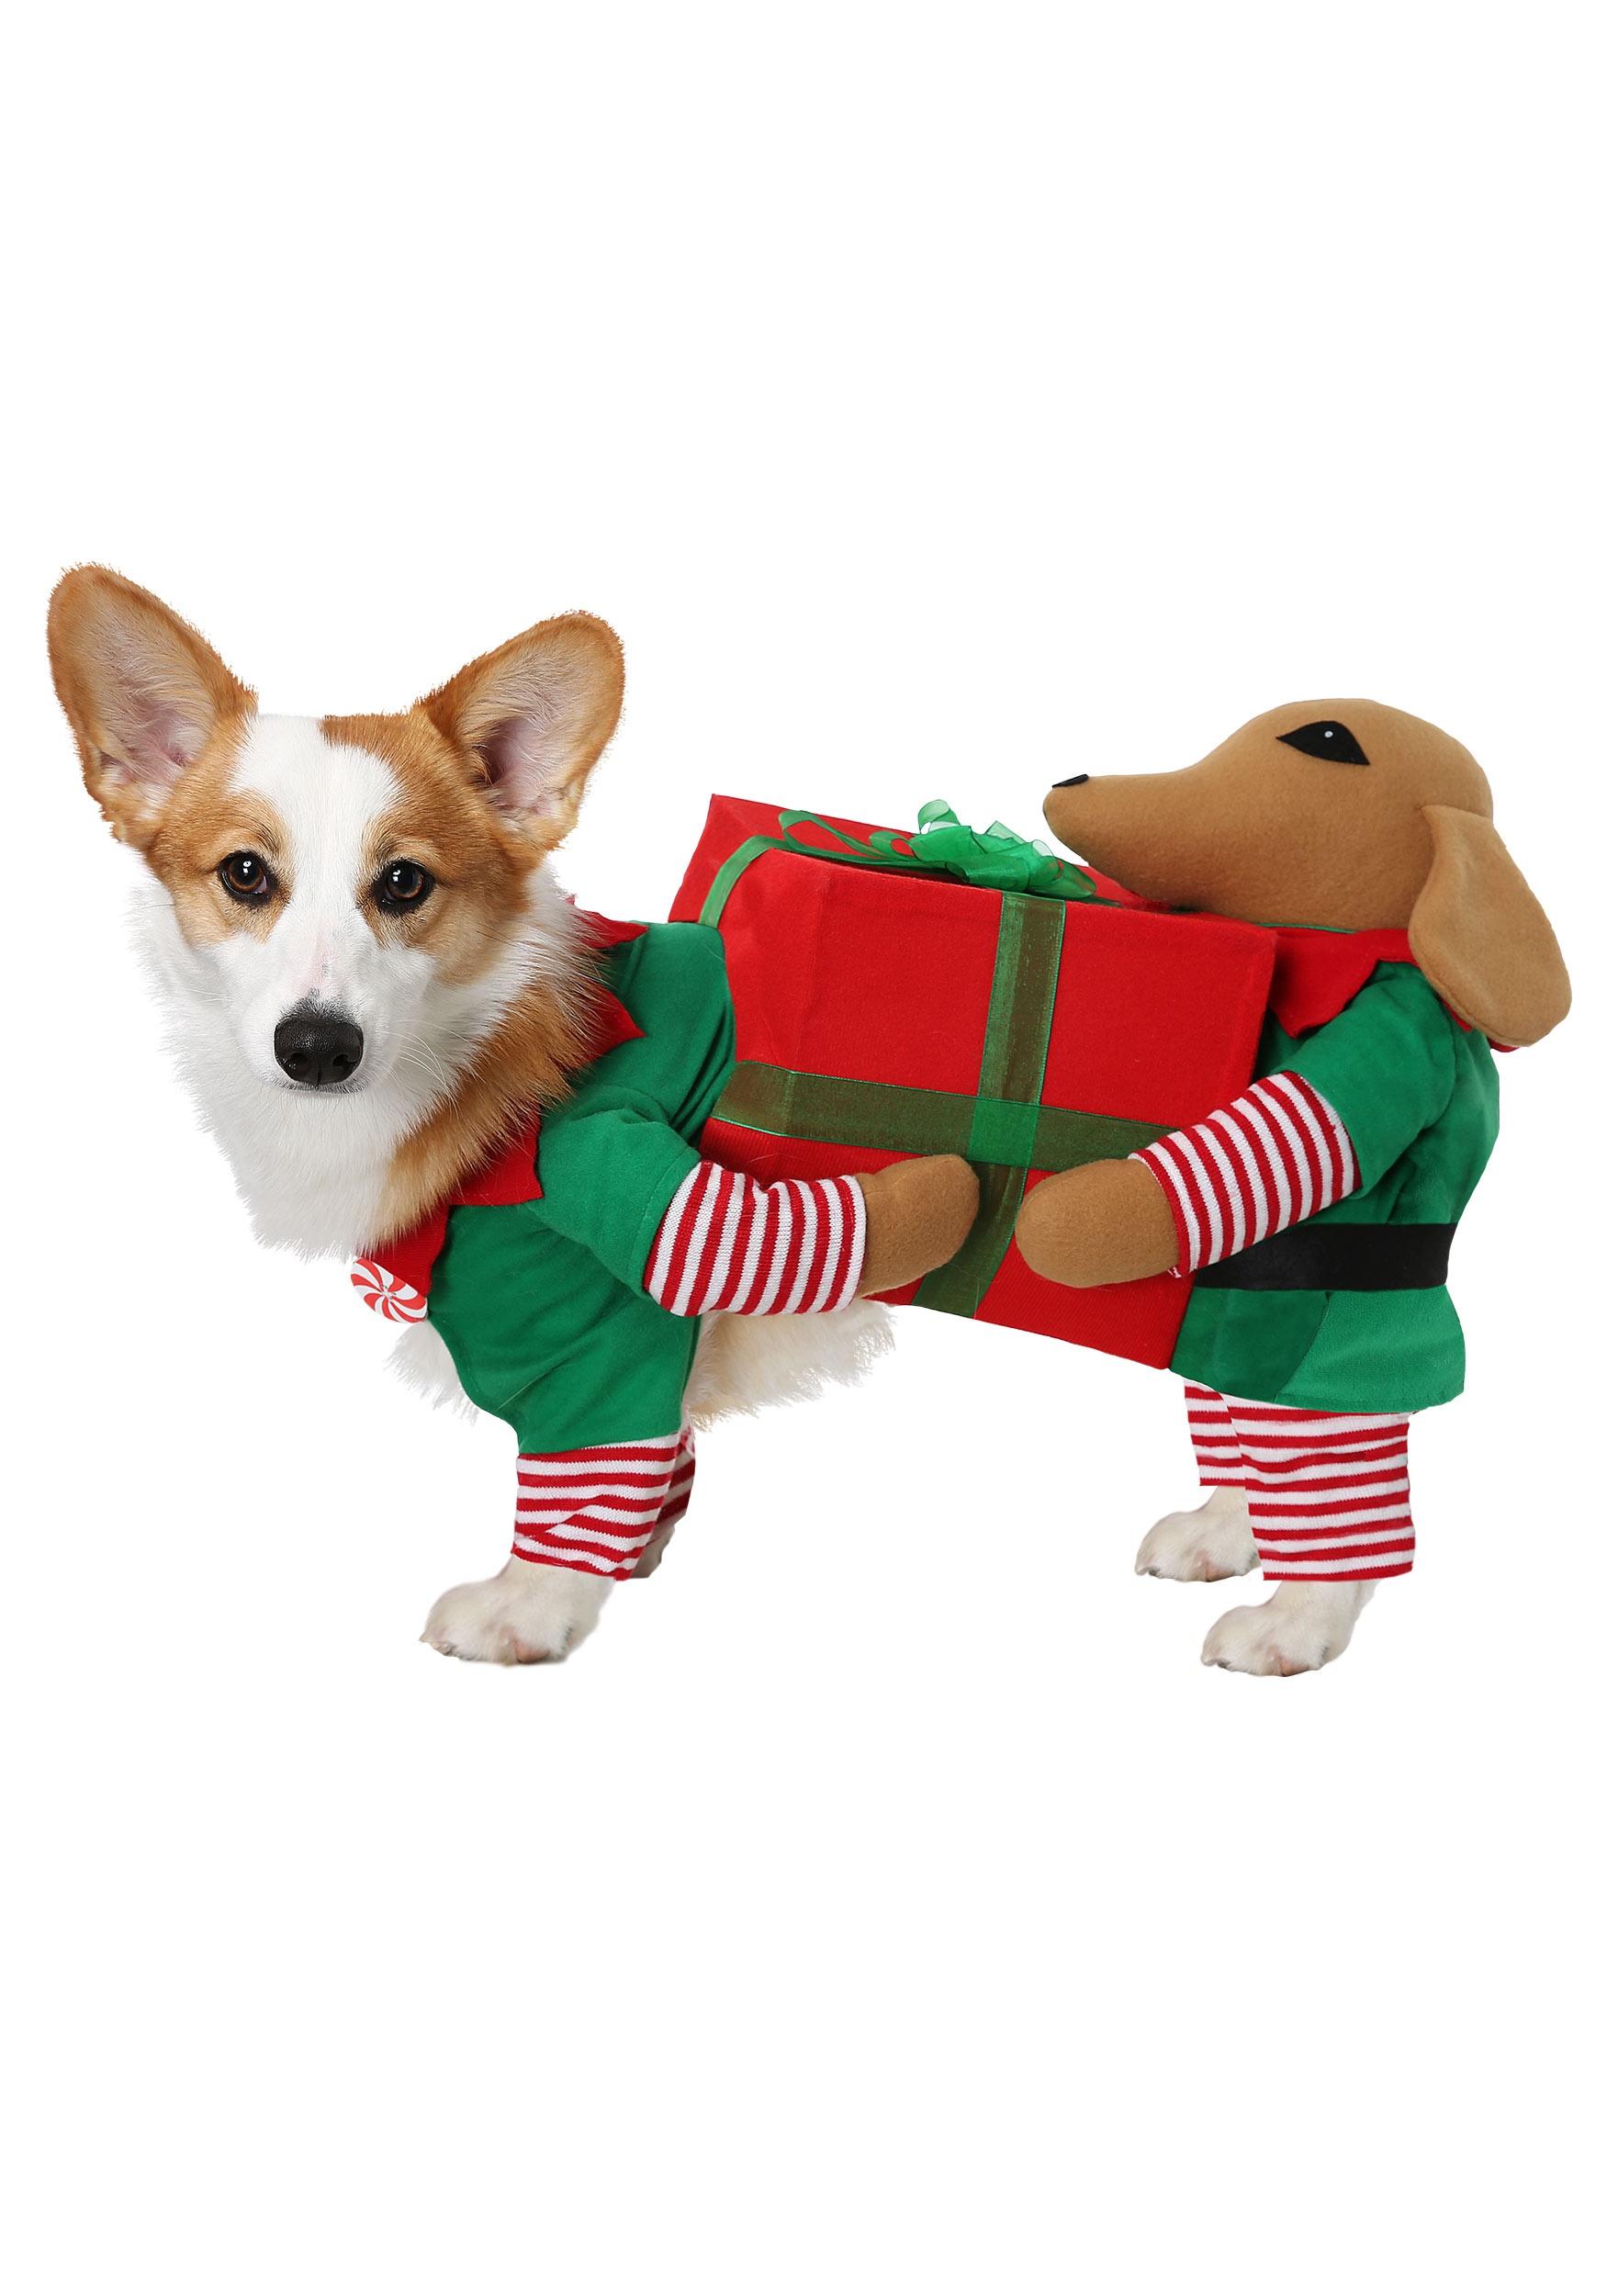 Pet Costumes - Cat & Dog Halloween Costumes - HalloweenCostumes.com